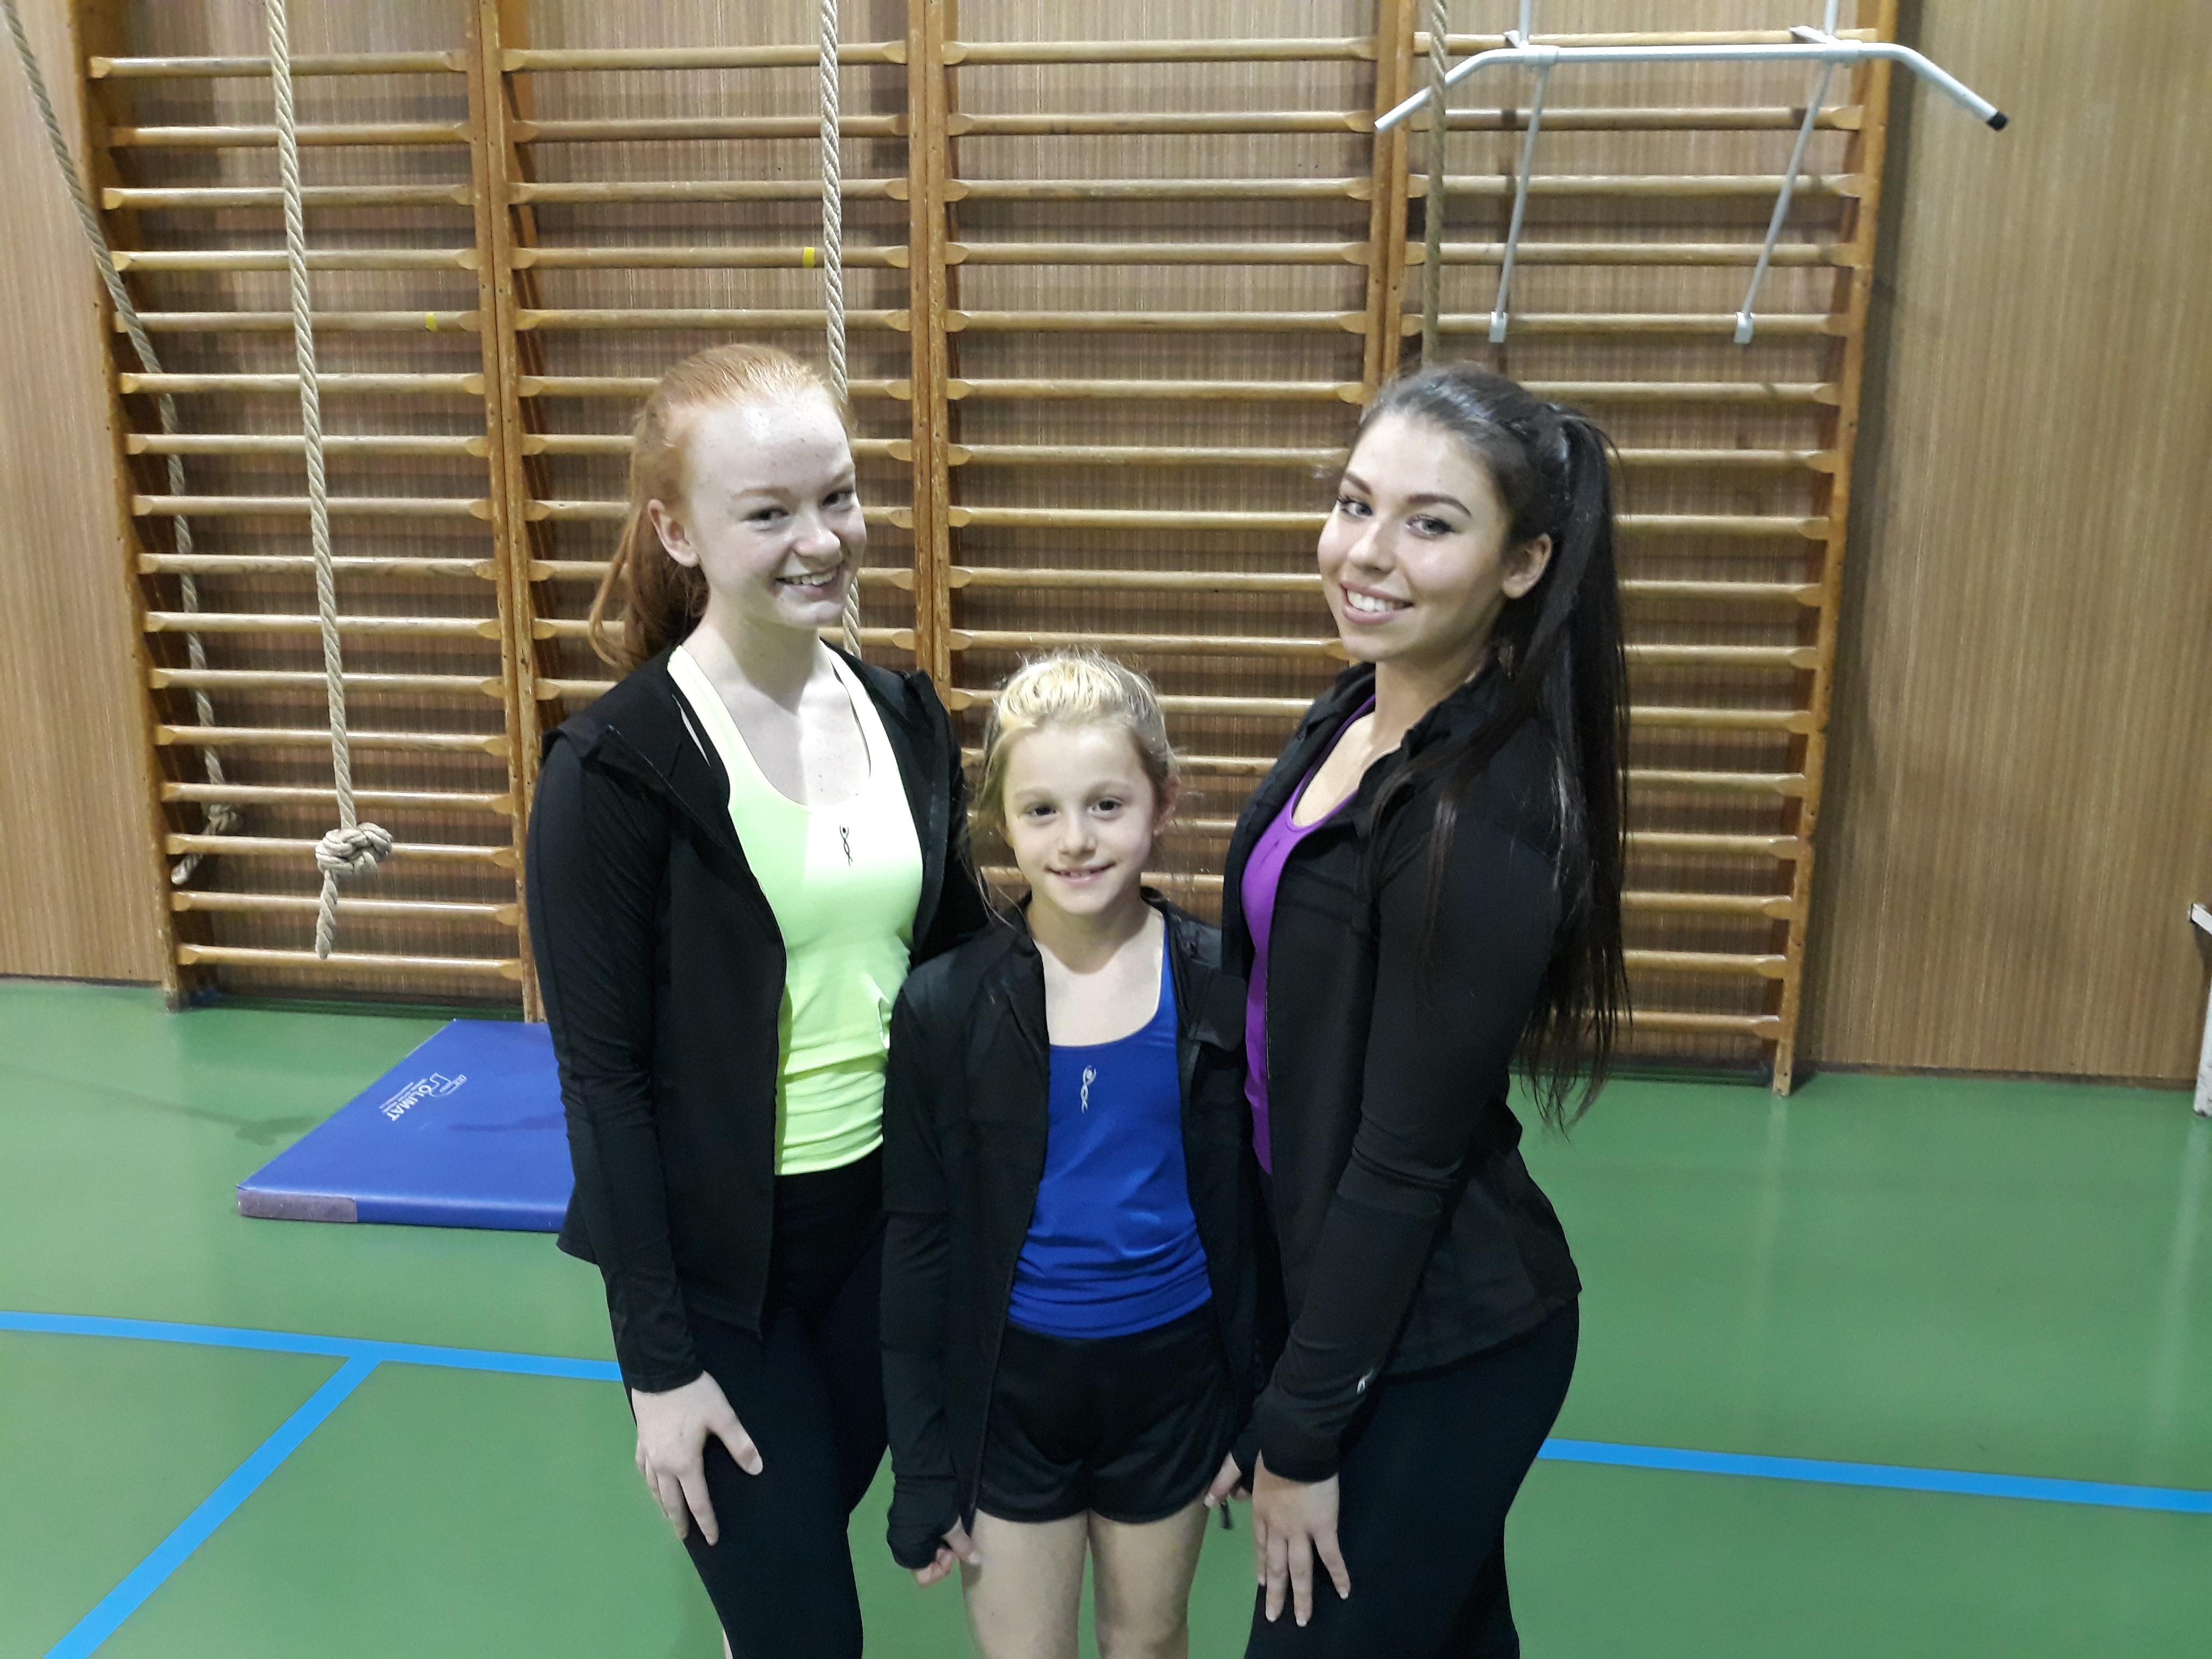 Venturelli - podpora sportu - Natálie Malkusová